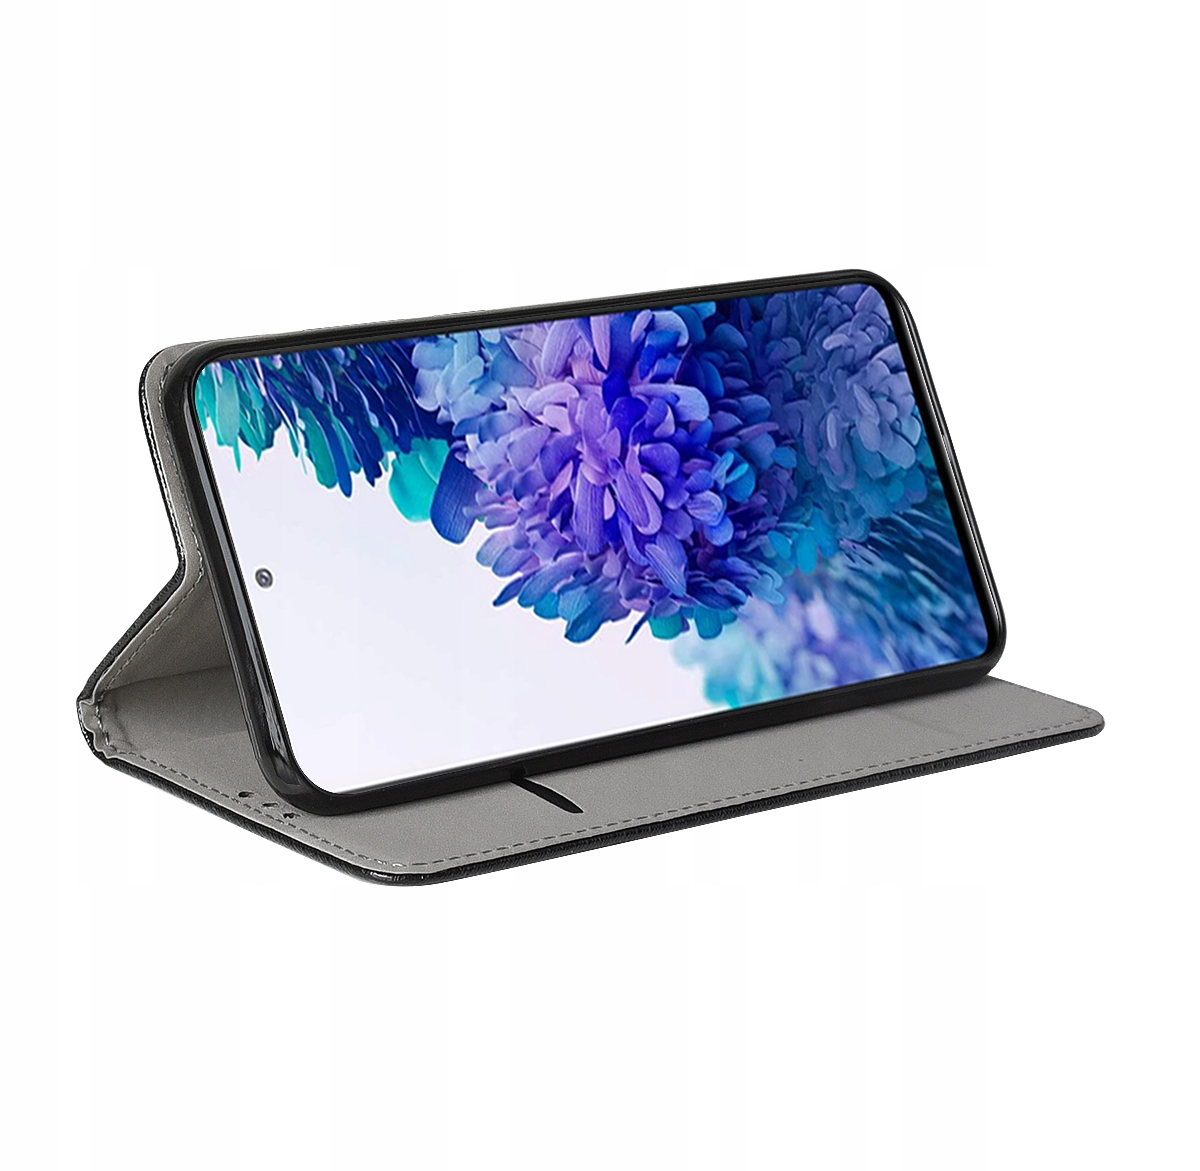 Etui do Samsung Galaxy S20 FE Case Magnet + Szkło Kod producenta 5900495871336